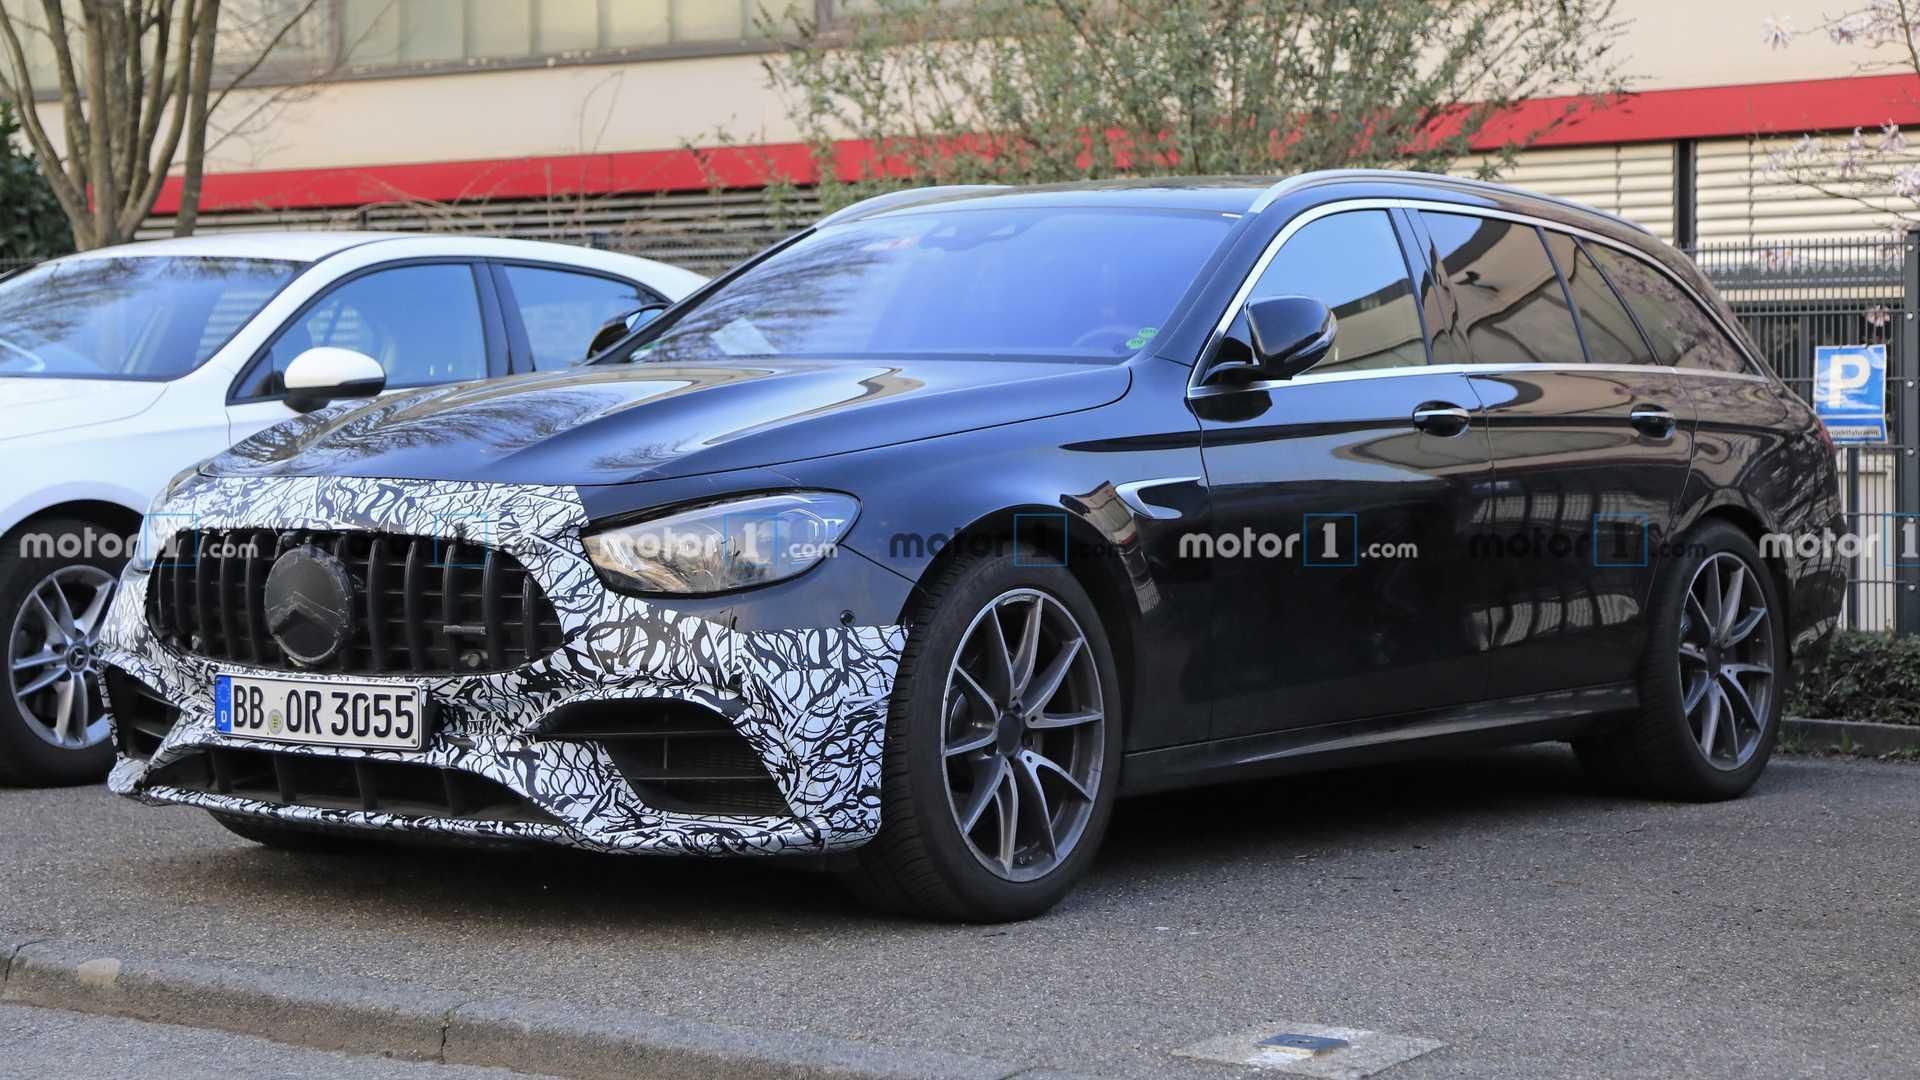 2020 - [Mercedes-Benz] Classe E restylée  - Page 6 2021-mercedes-amg-e63-wagon-facelift-spy-photo